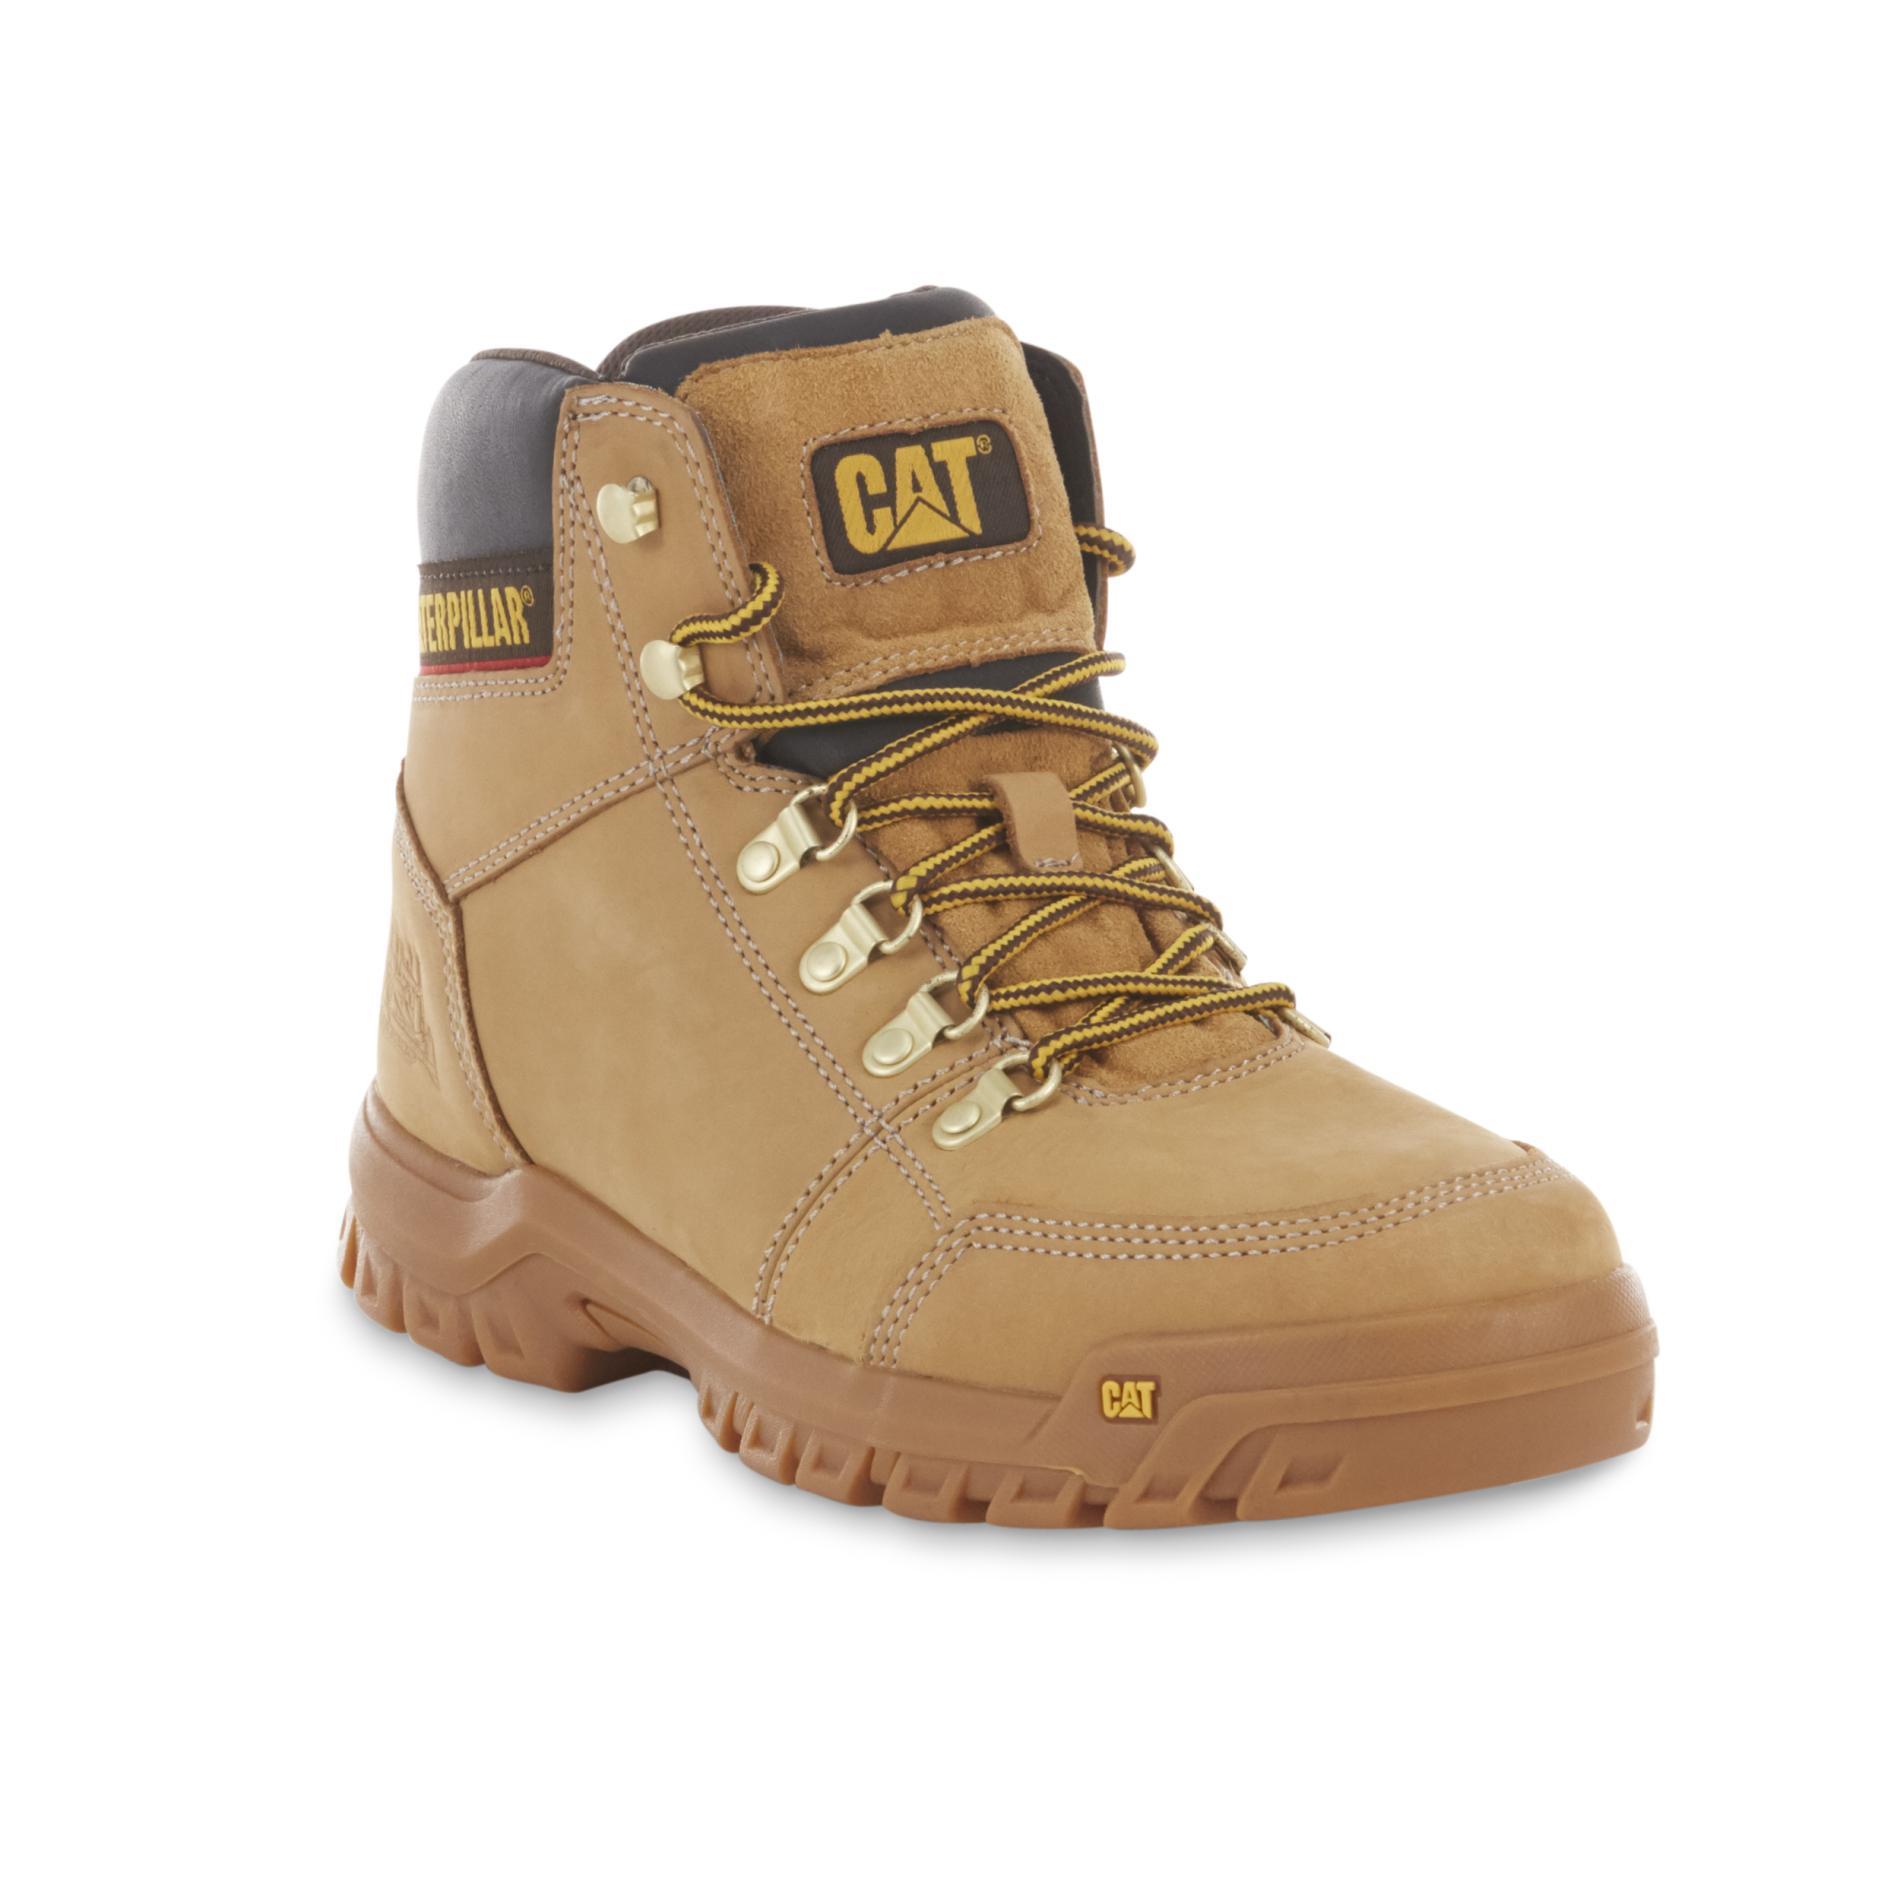 cat shoes cat footwear menu0027s outline 6 lerkbvm